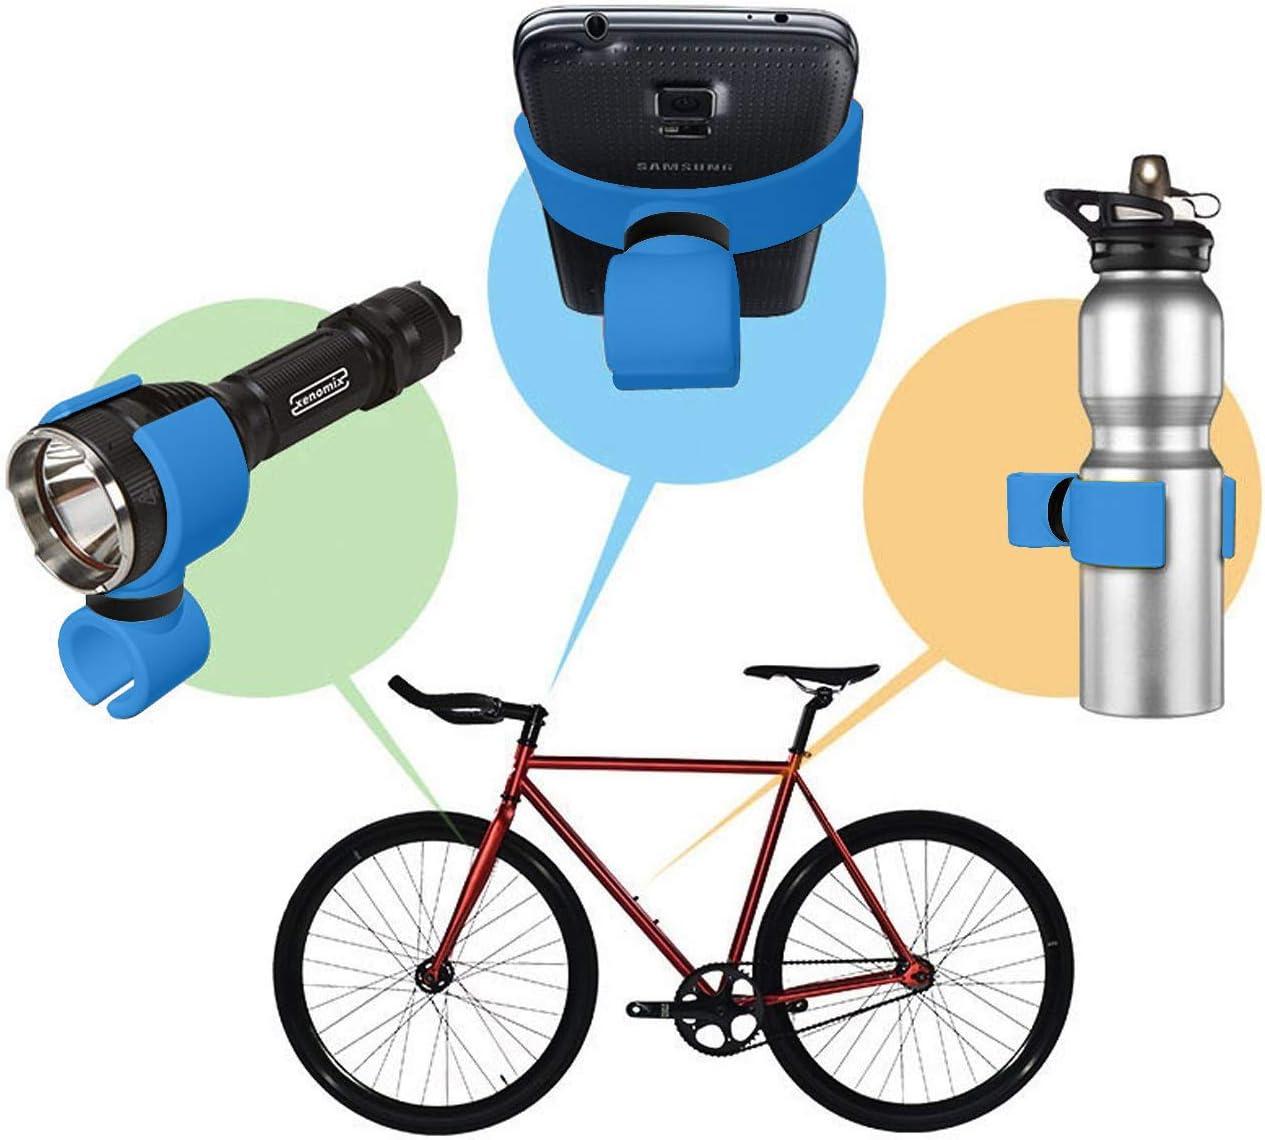 Soporte Huawei Mate 20 Pro bici soporte linterna bicicleta soporte ...